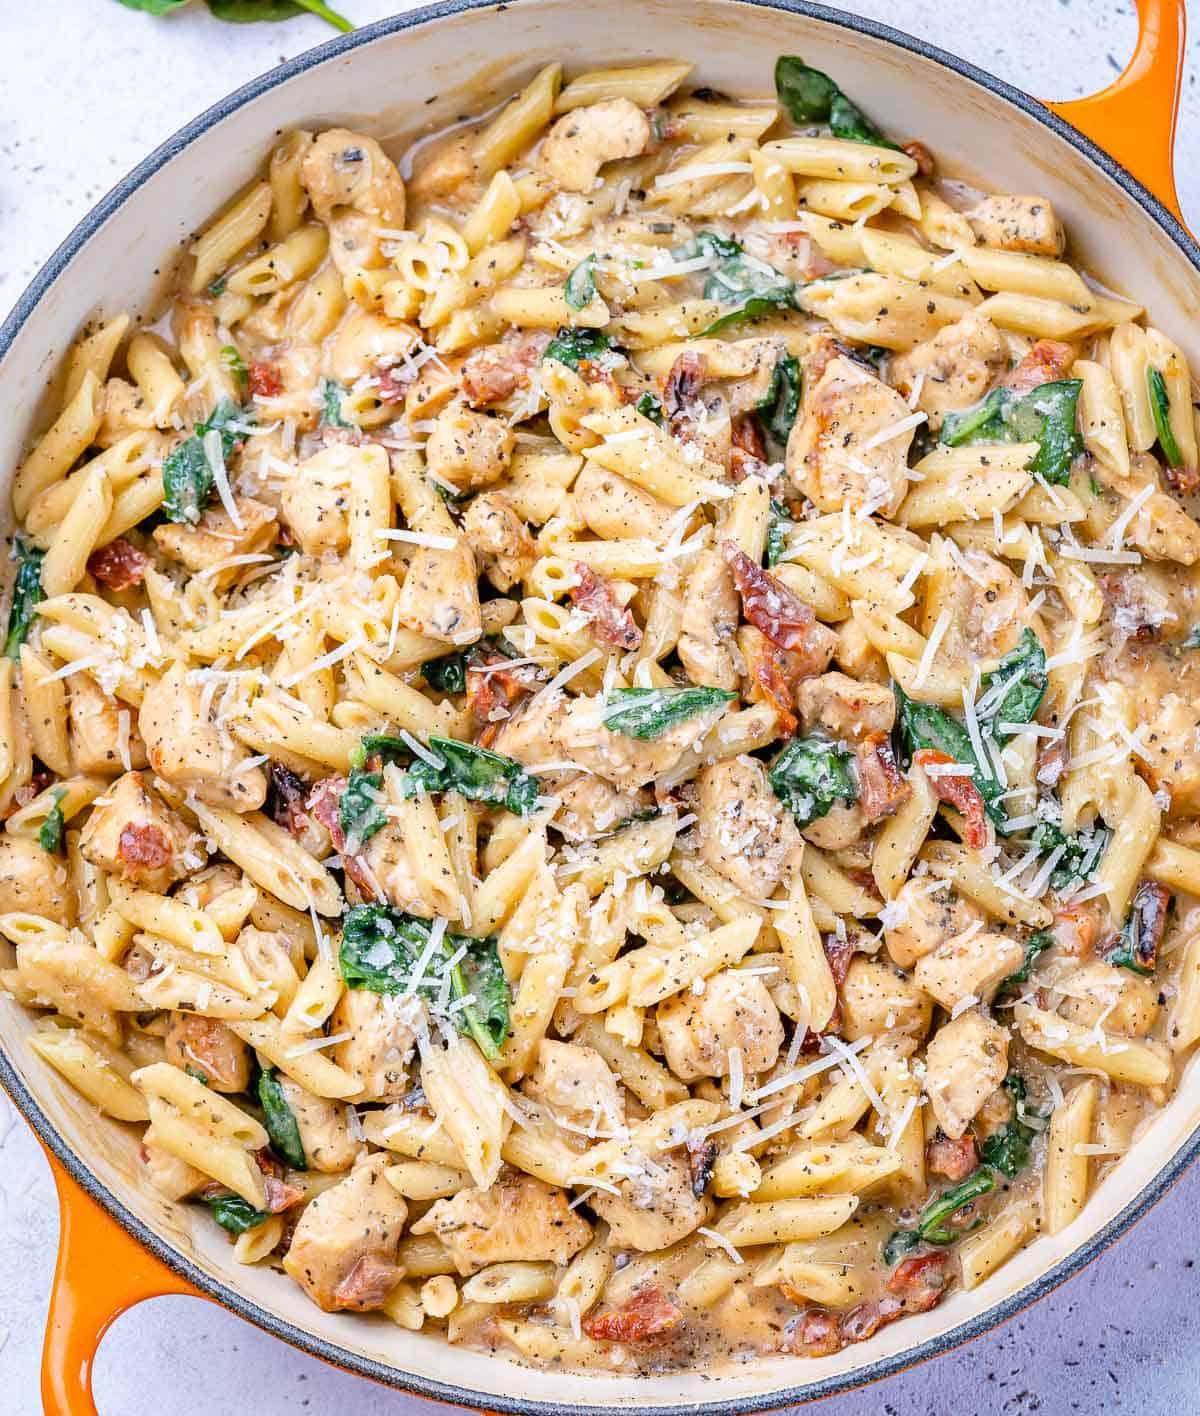 top view chicken pasta with spinach in an orange skillet